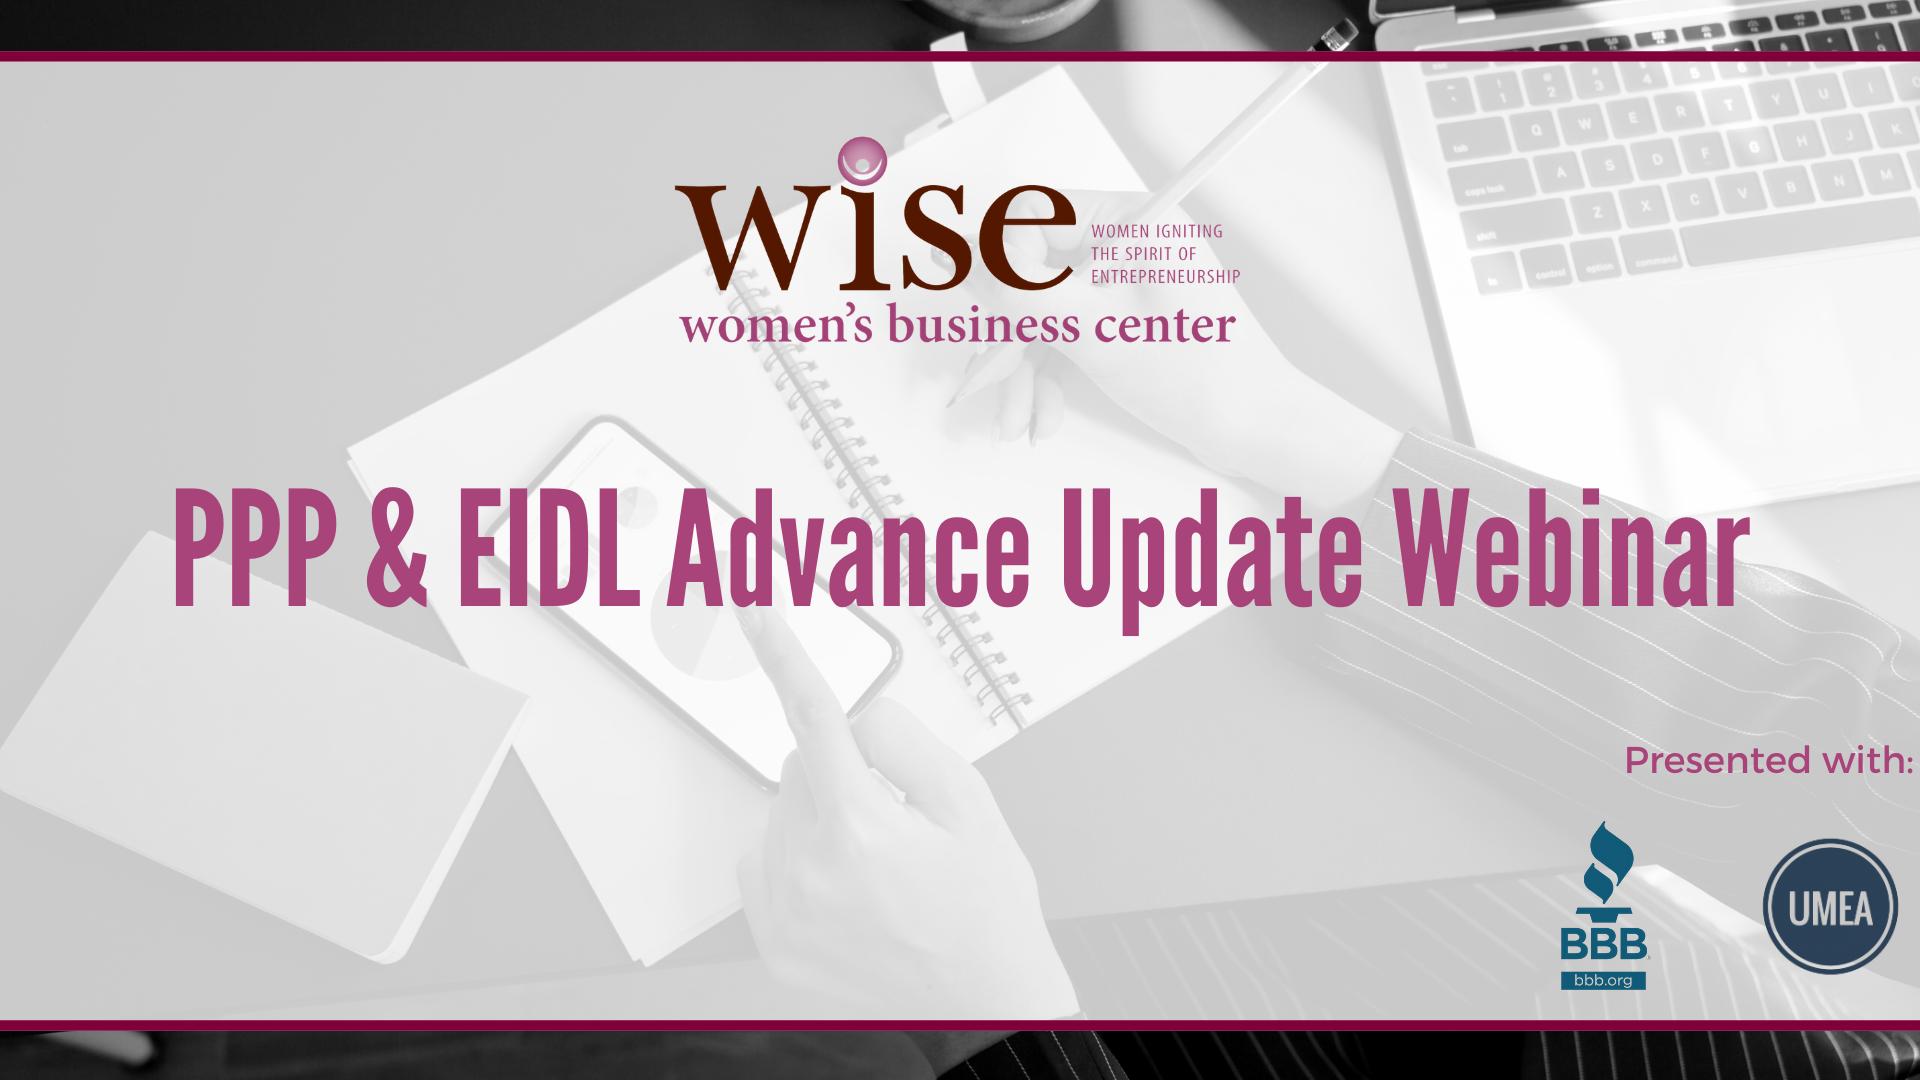 WISE Women's Business Center